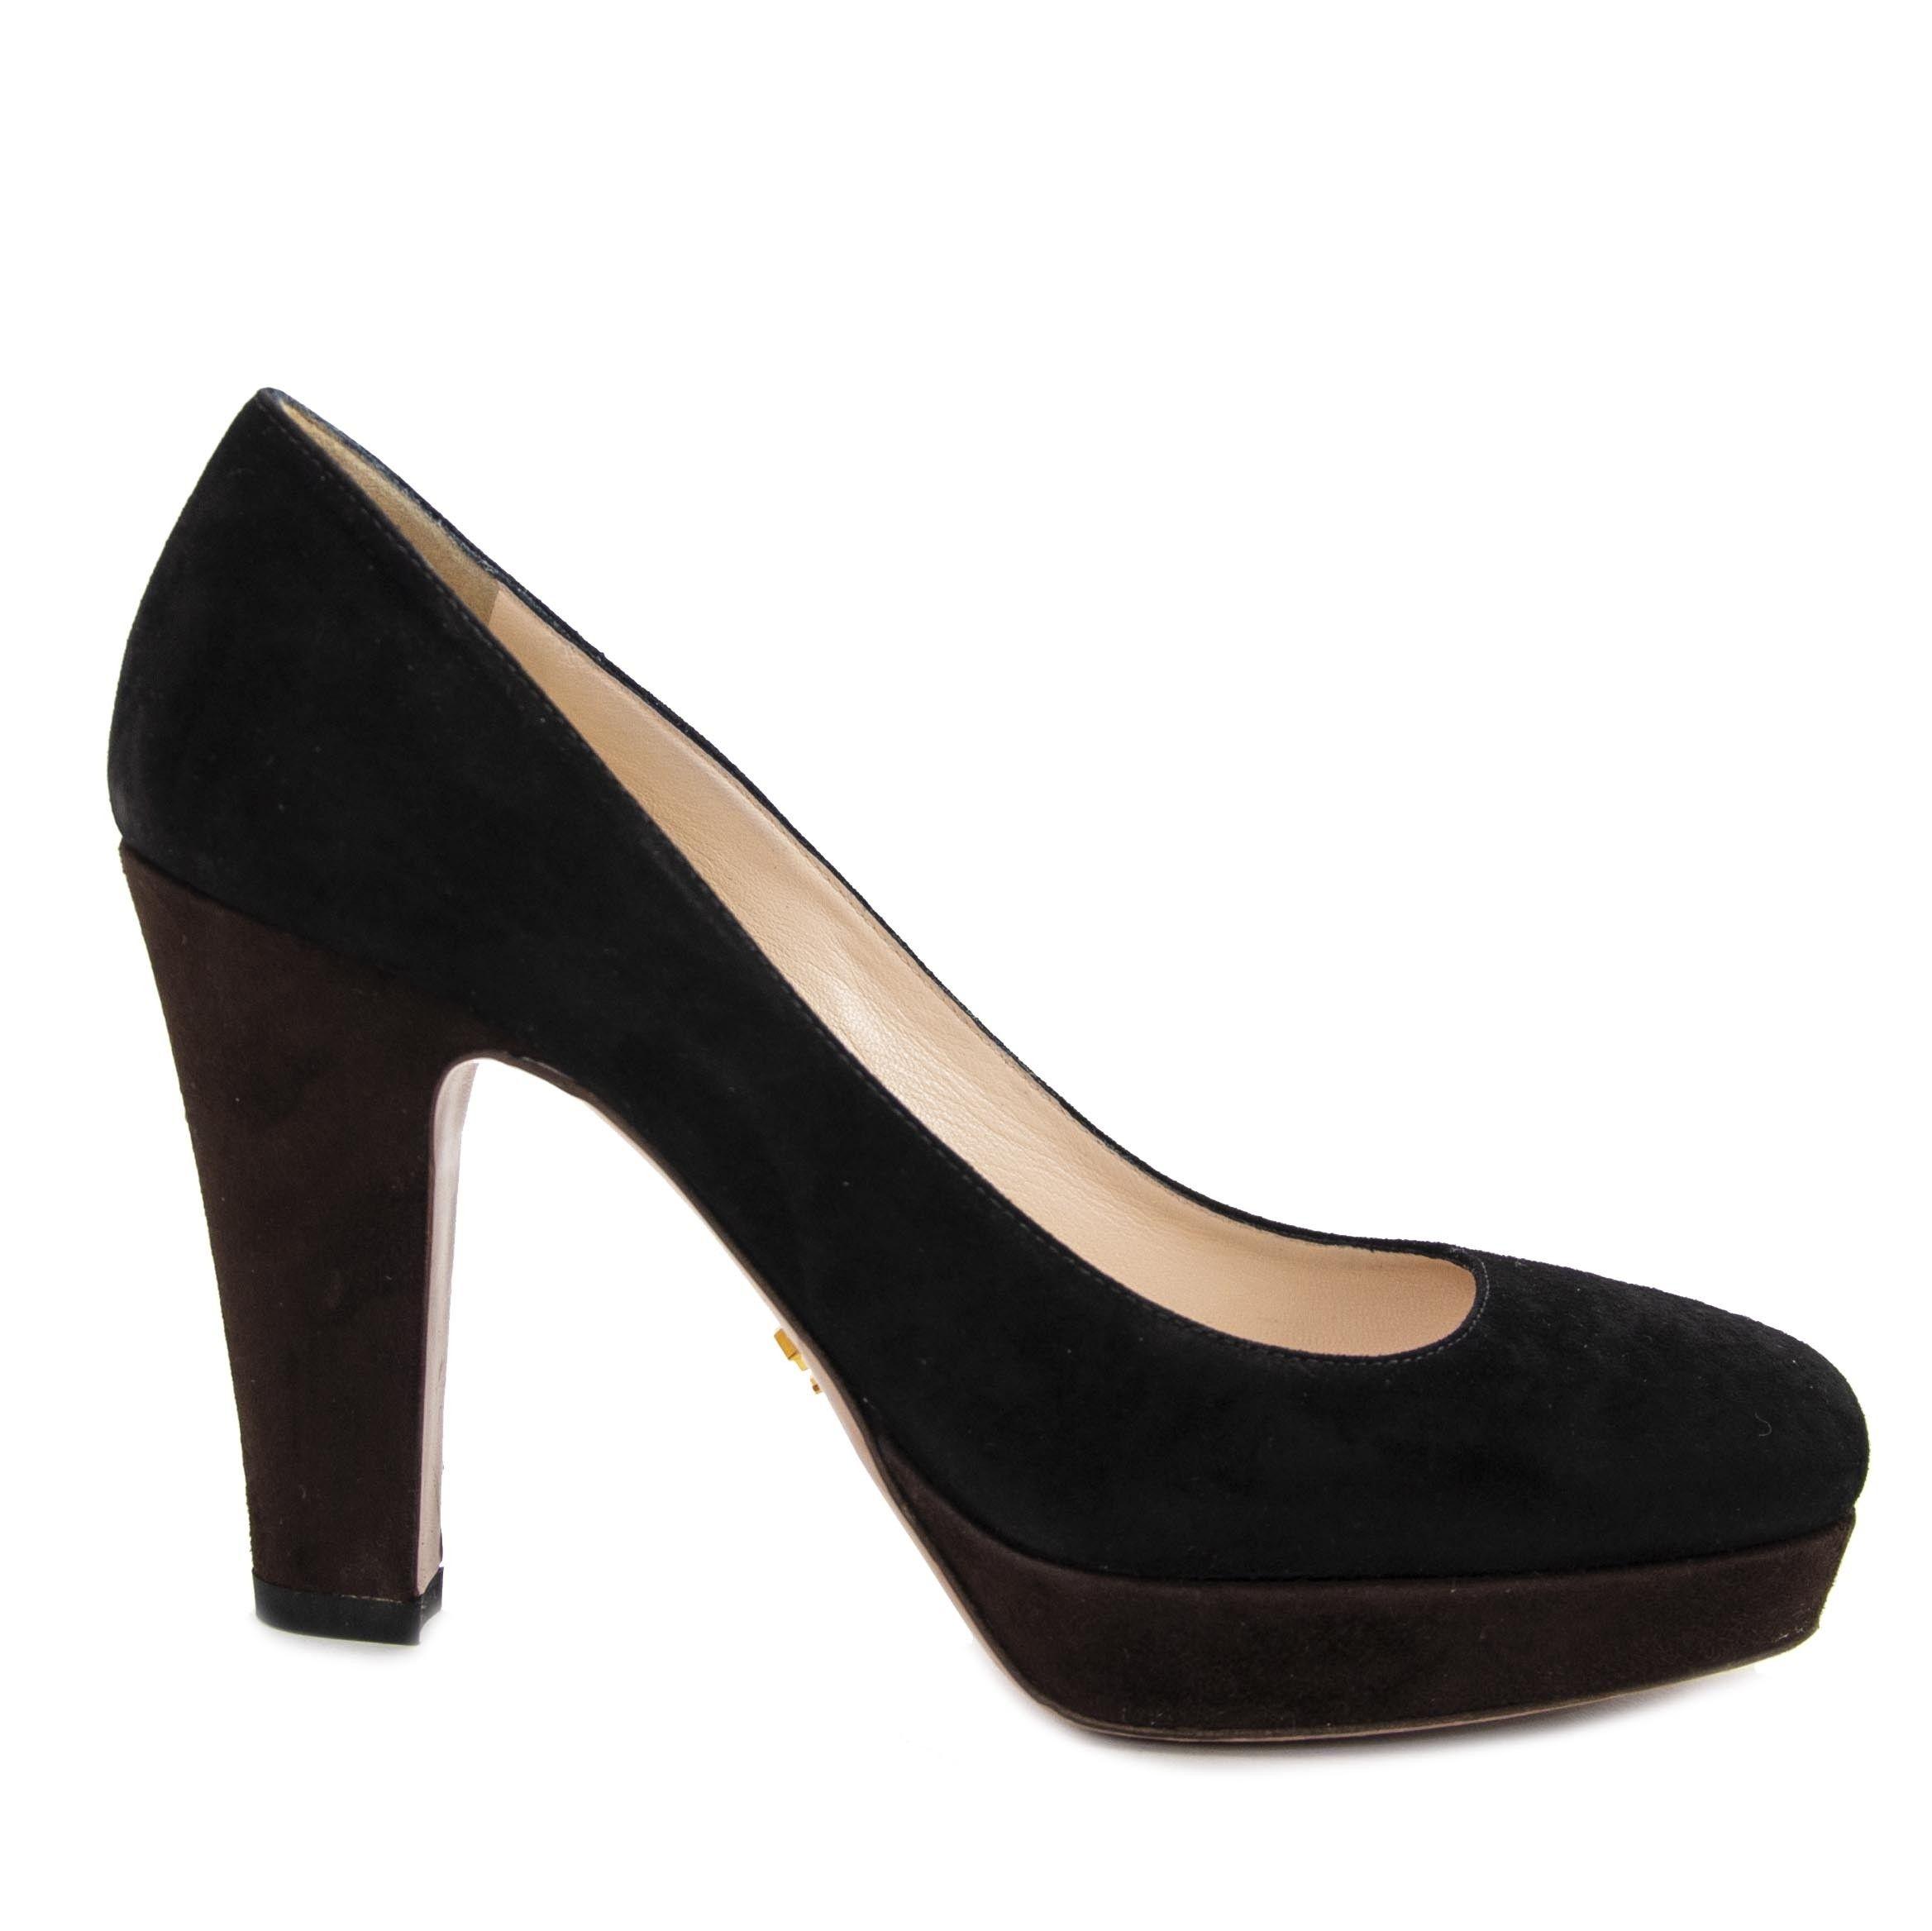 c2e03e7e968ba Prada Brown And Black Suede Heels - size 38 | Killer shoes we LOV in ...